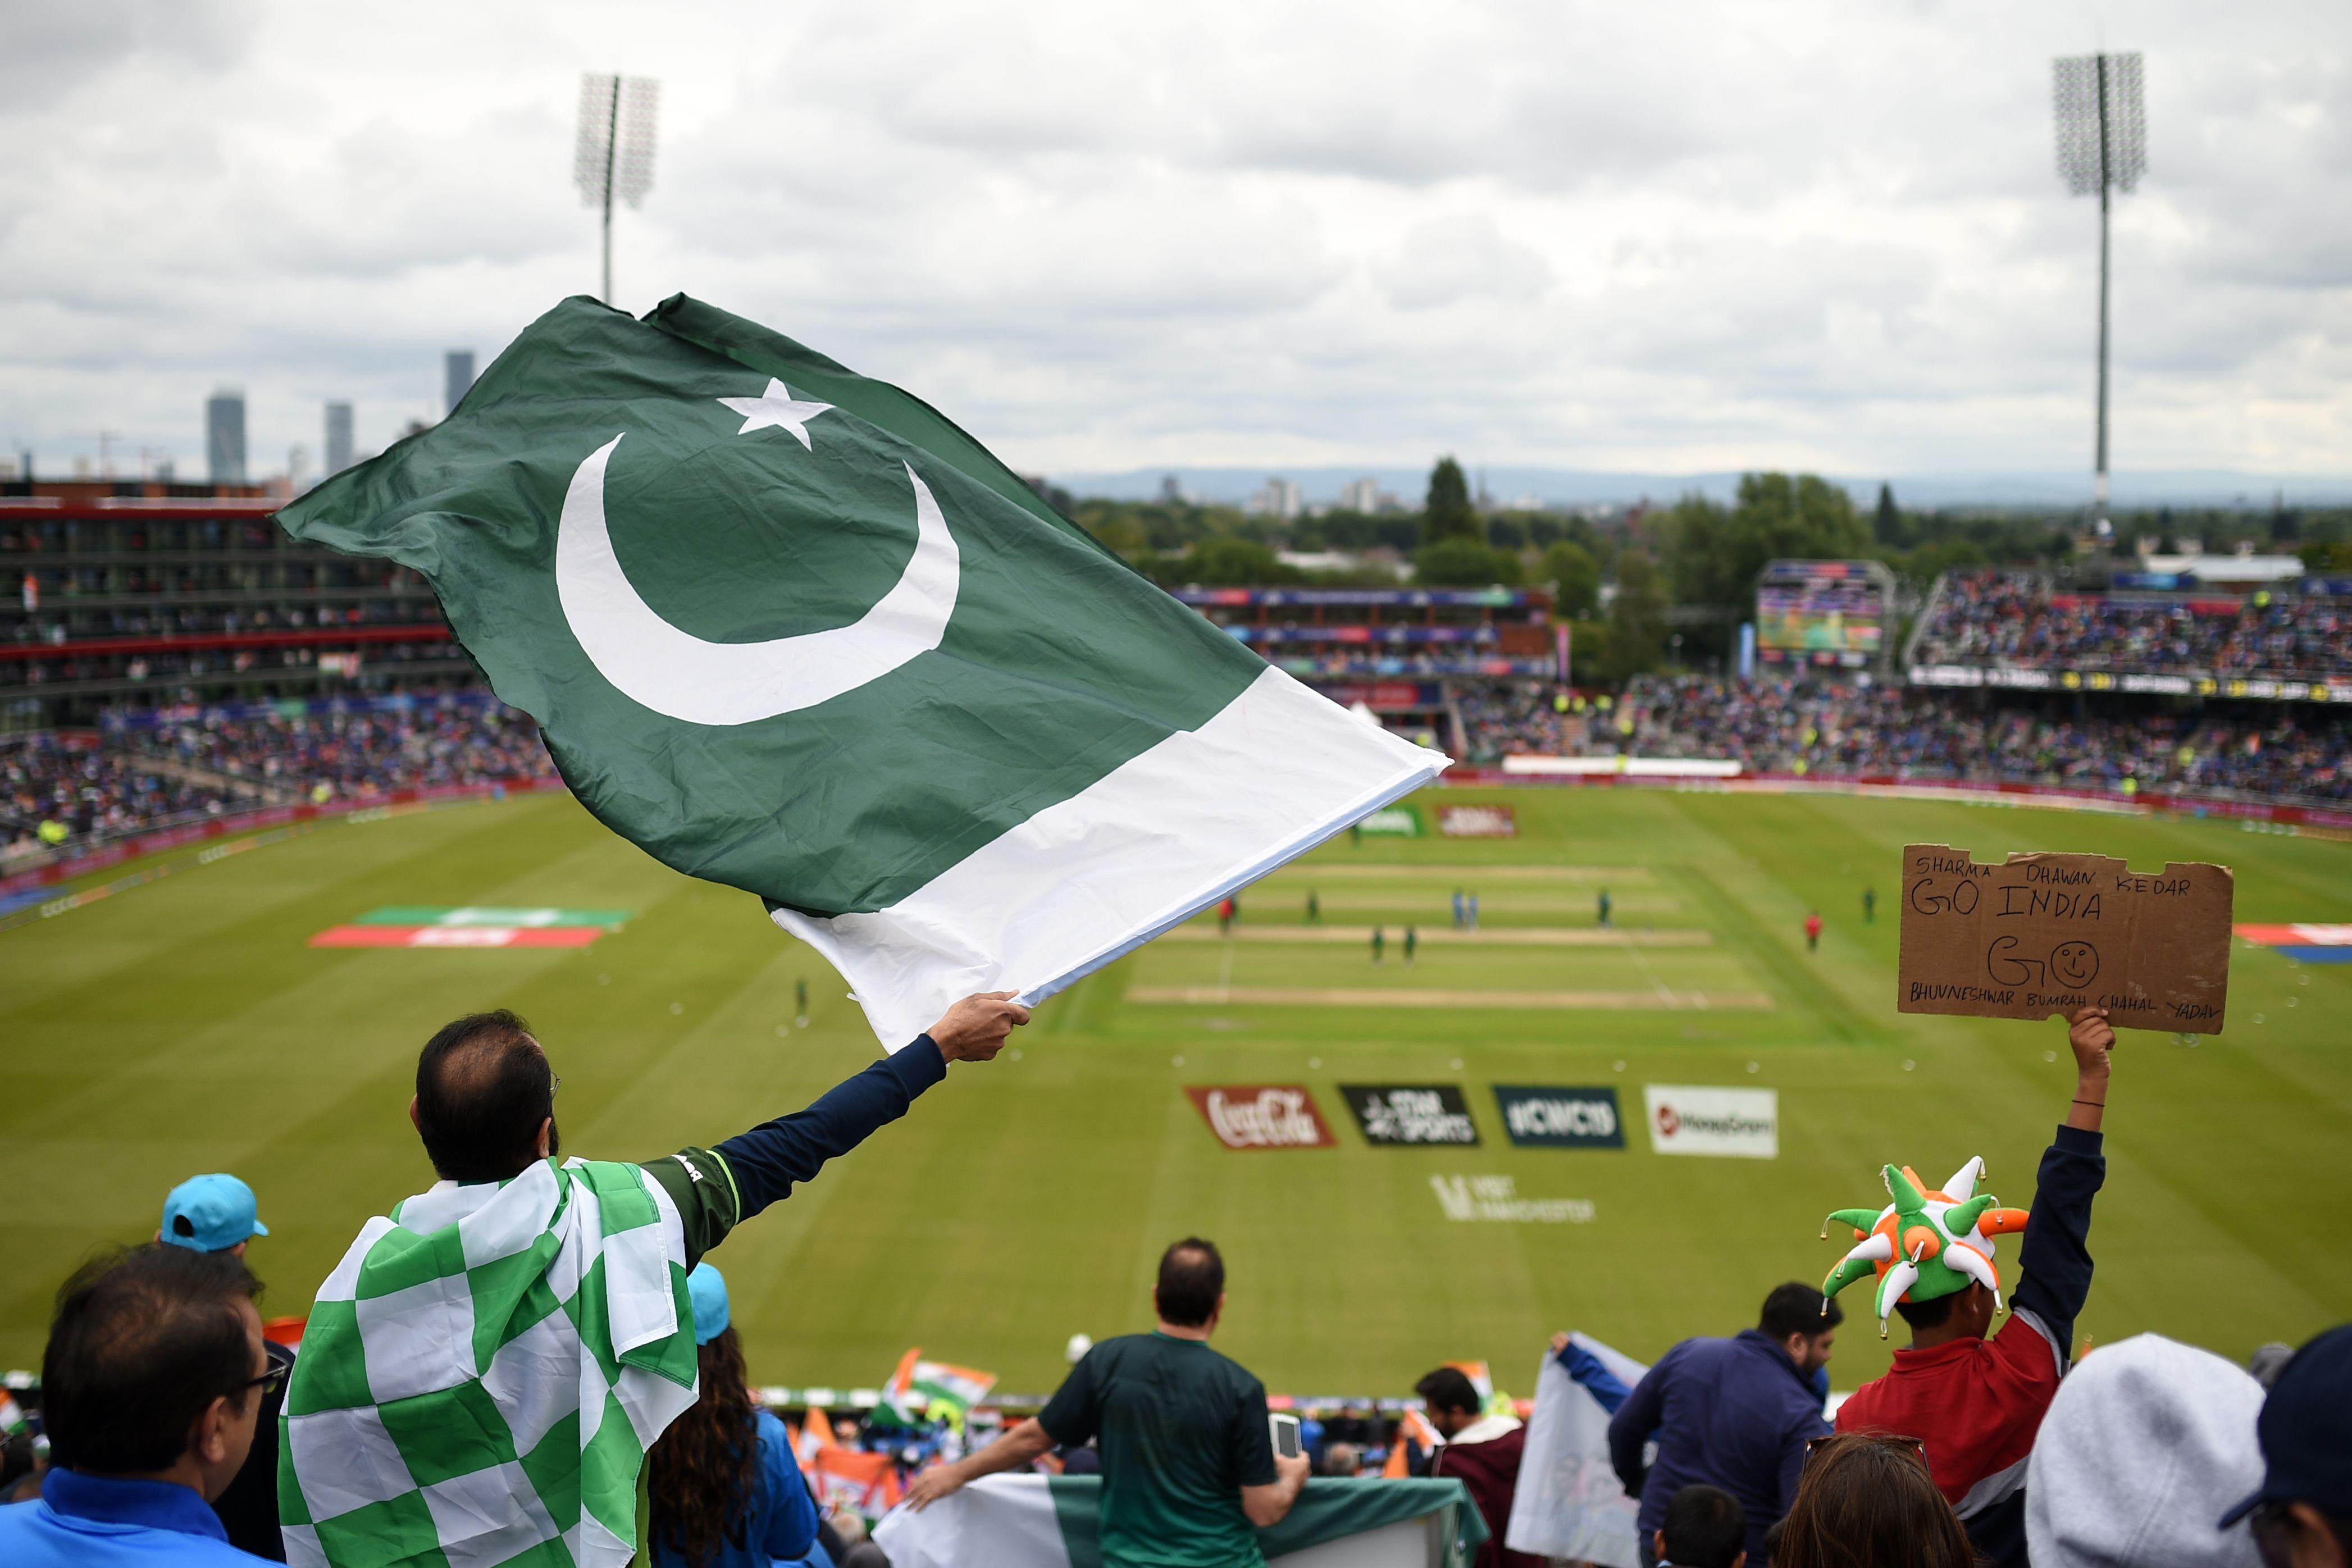 In Pictures: Pakistan vs India frenzy | - geosuper tv